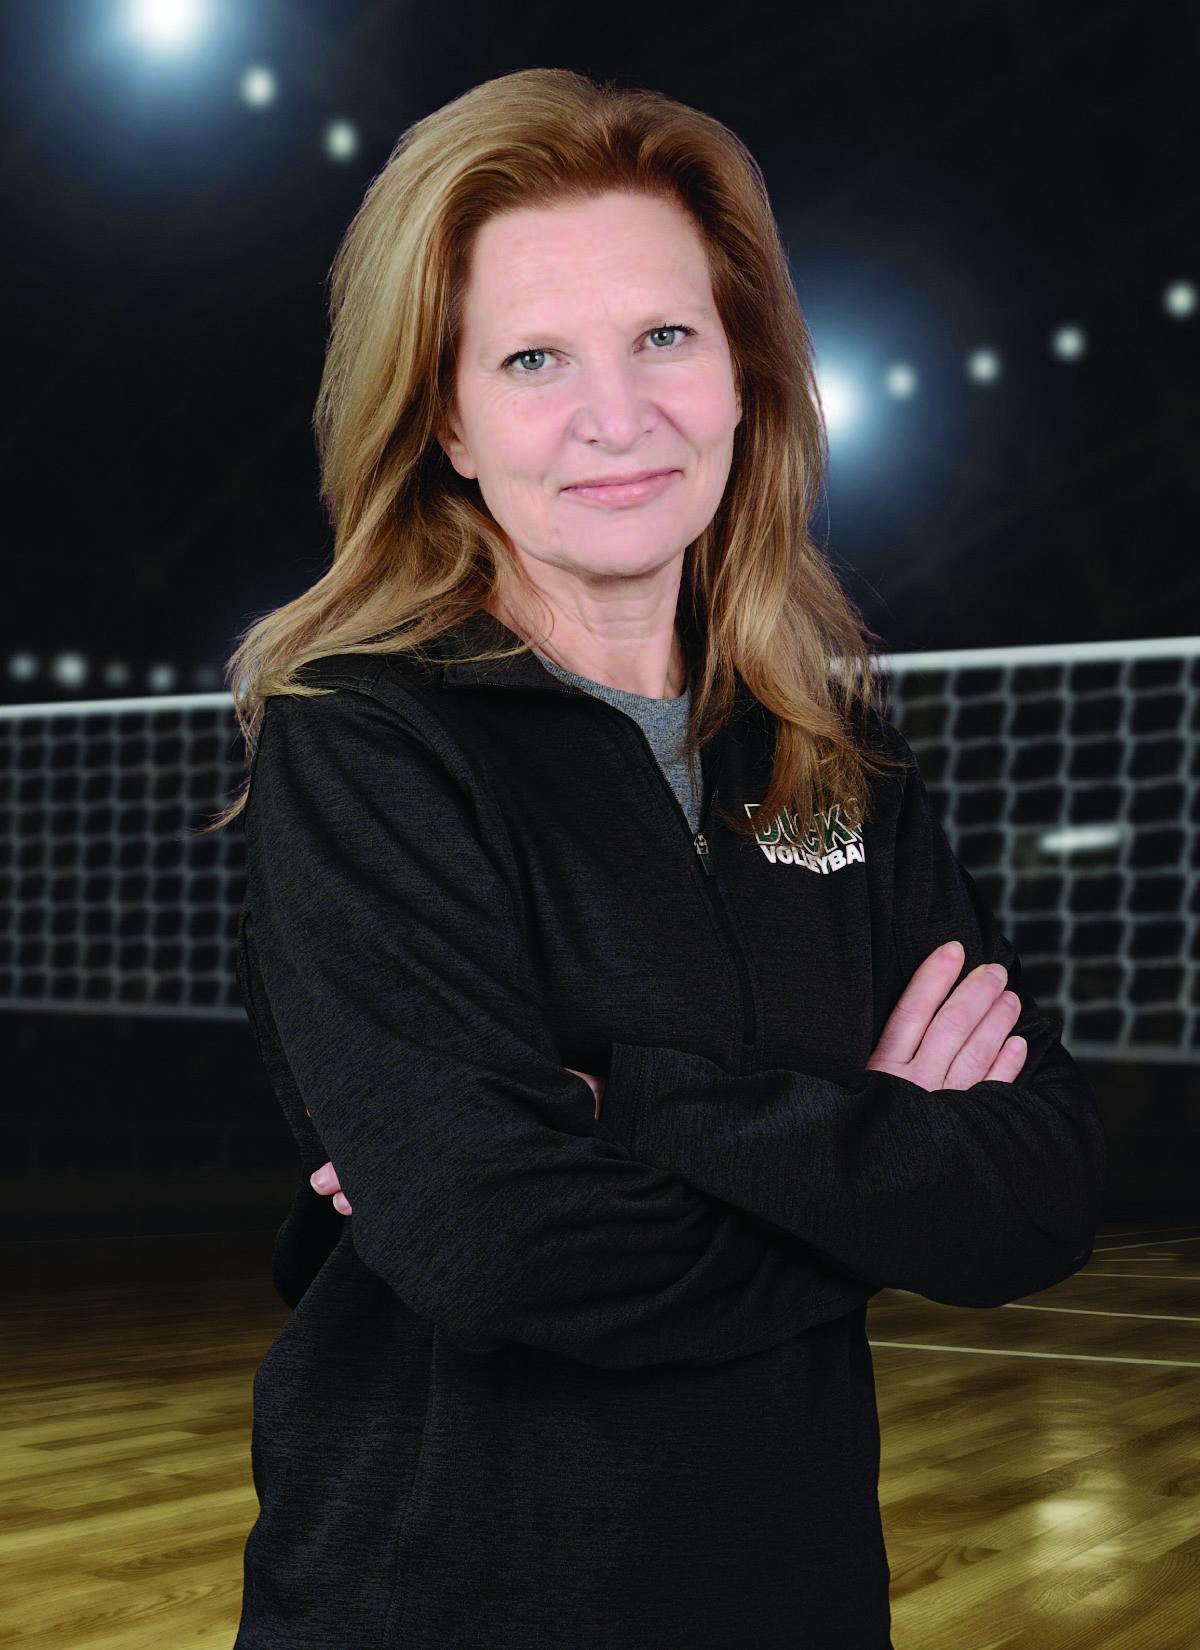 Karen Prinsloo